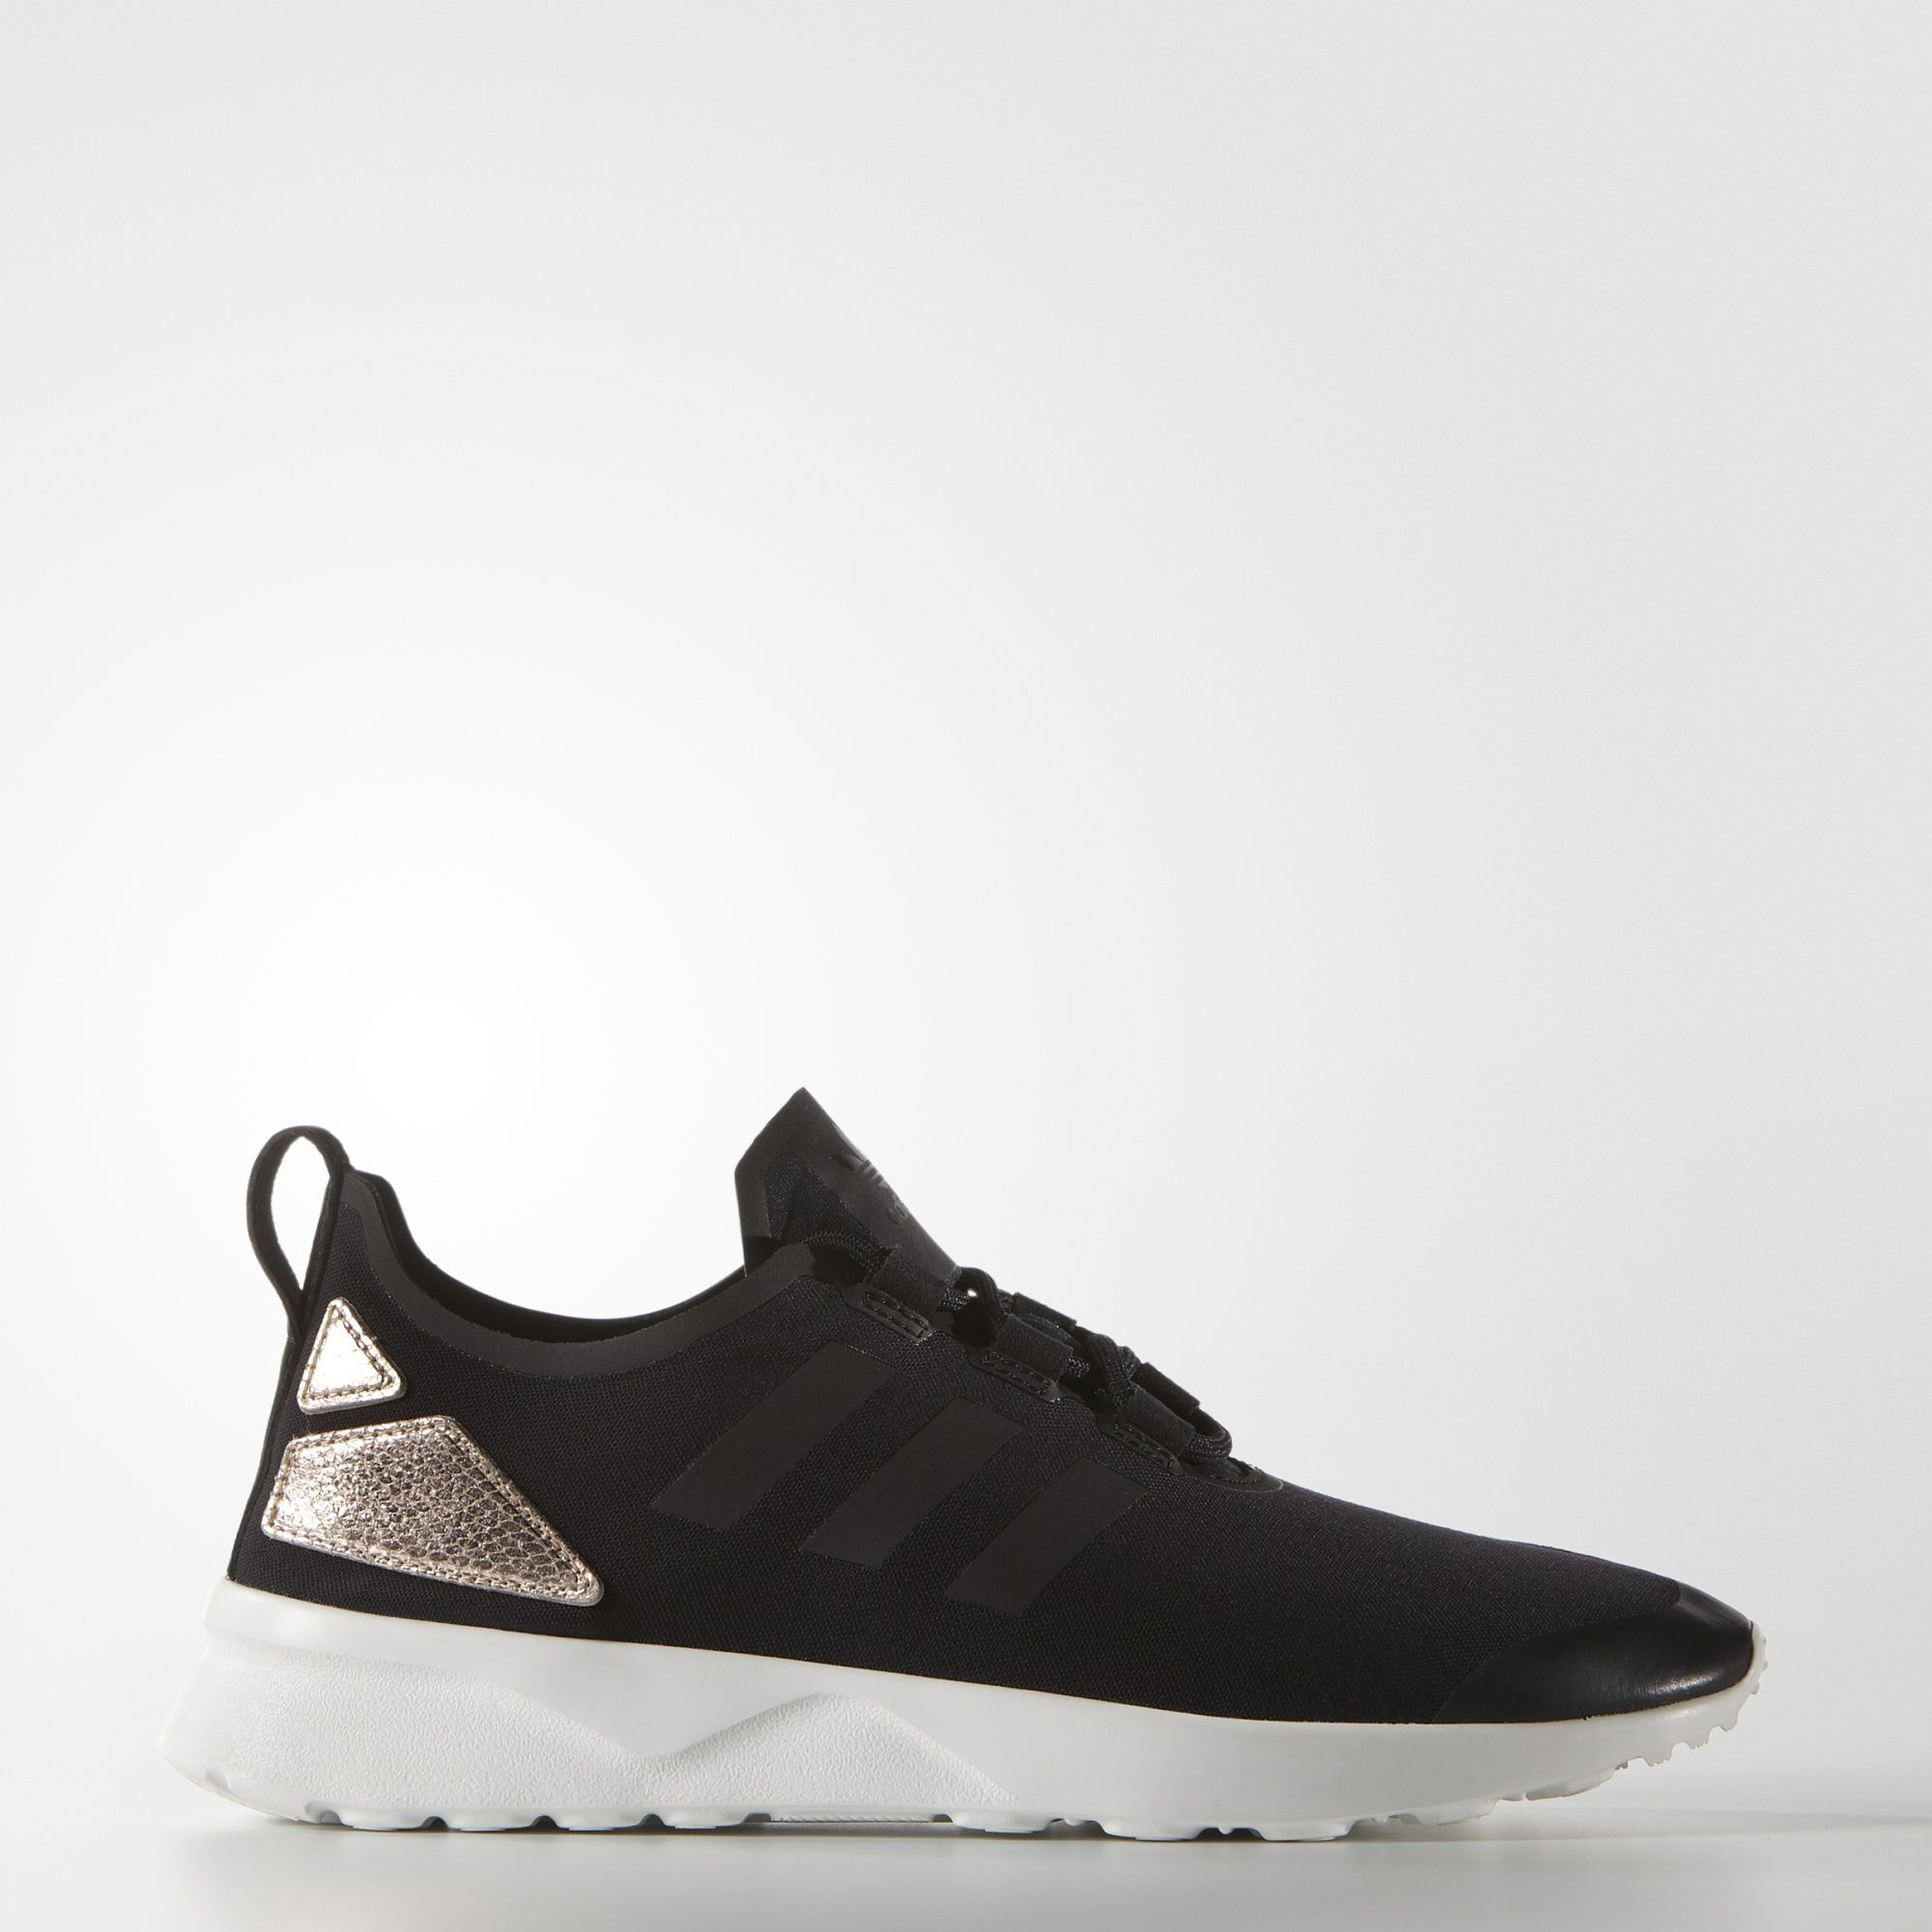 Adidas Zapatillas ZX Flux Verve Verve Verve   [ Schuhes ]   Pinterest efd4ee